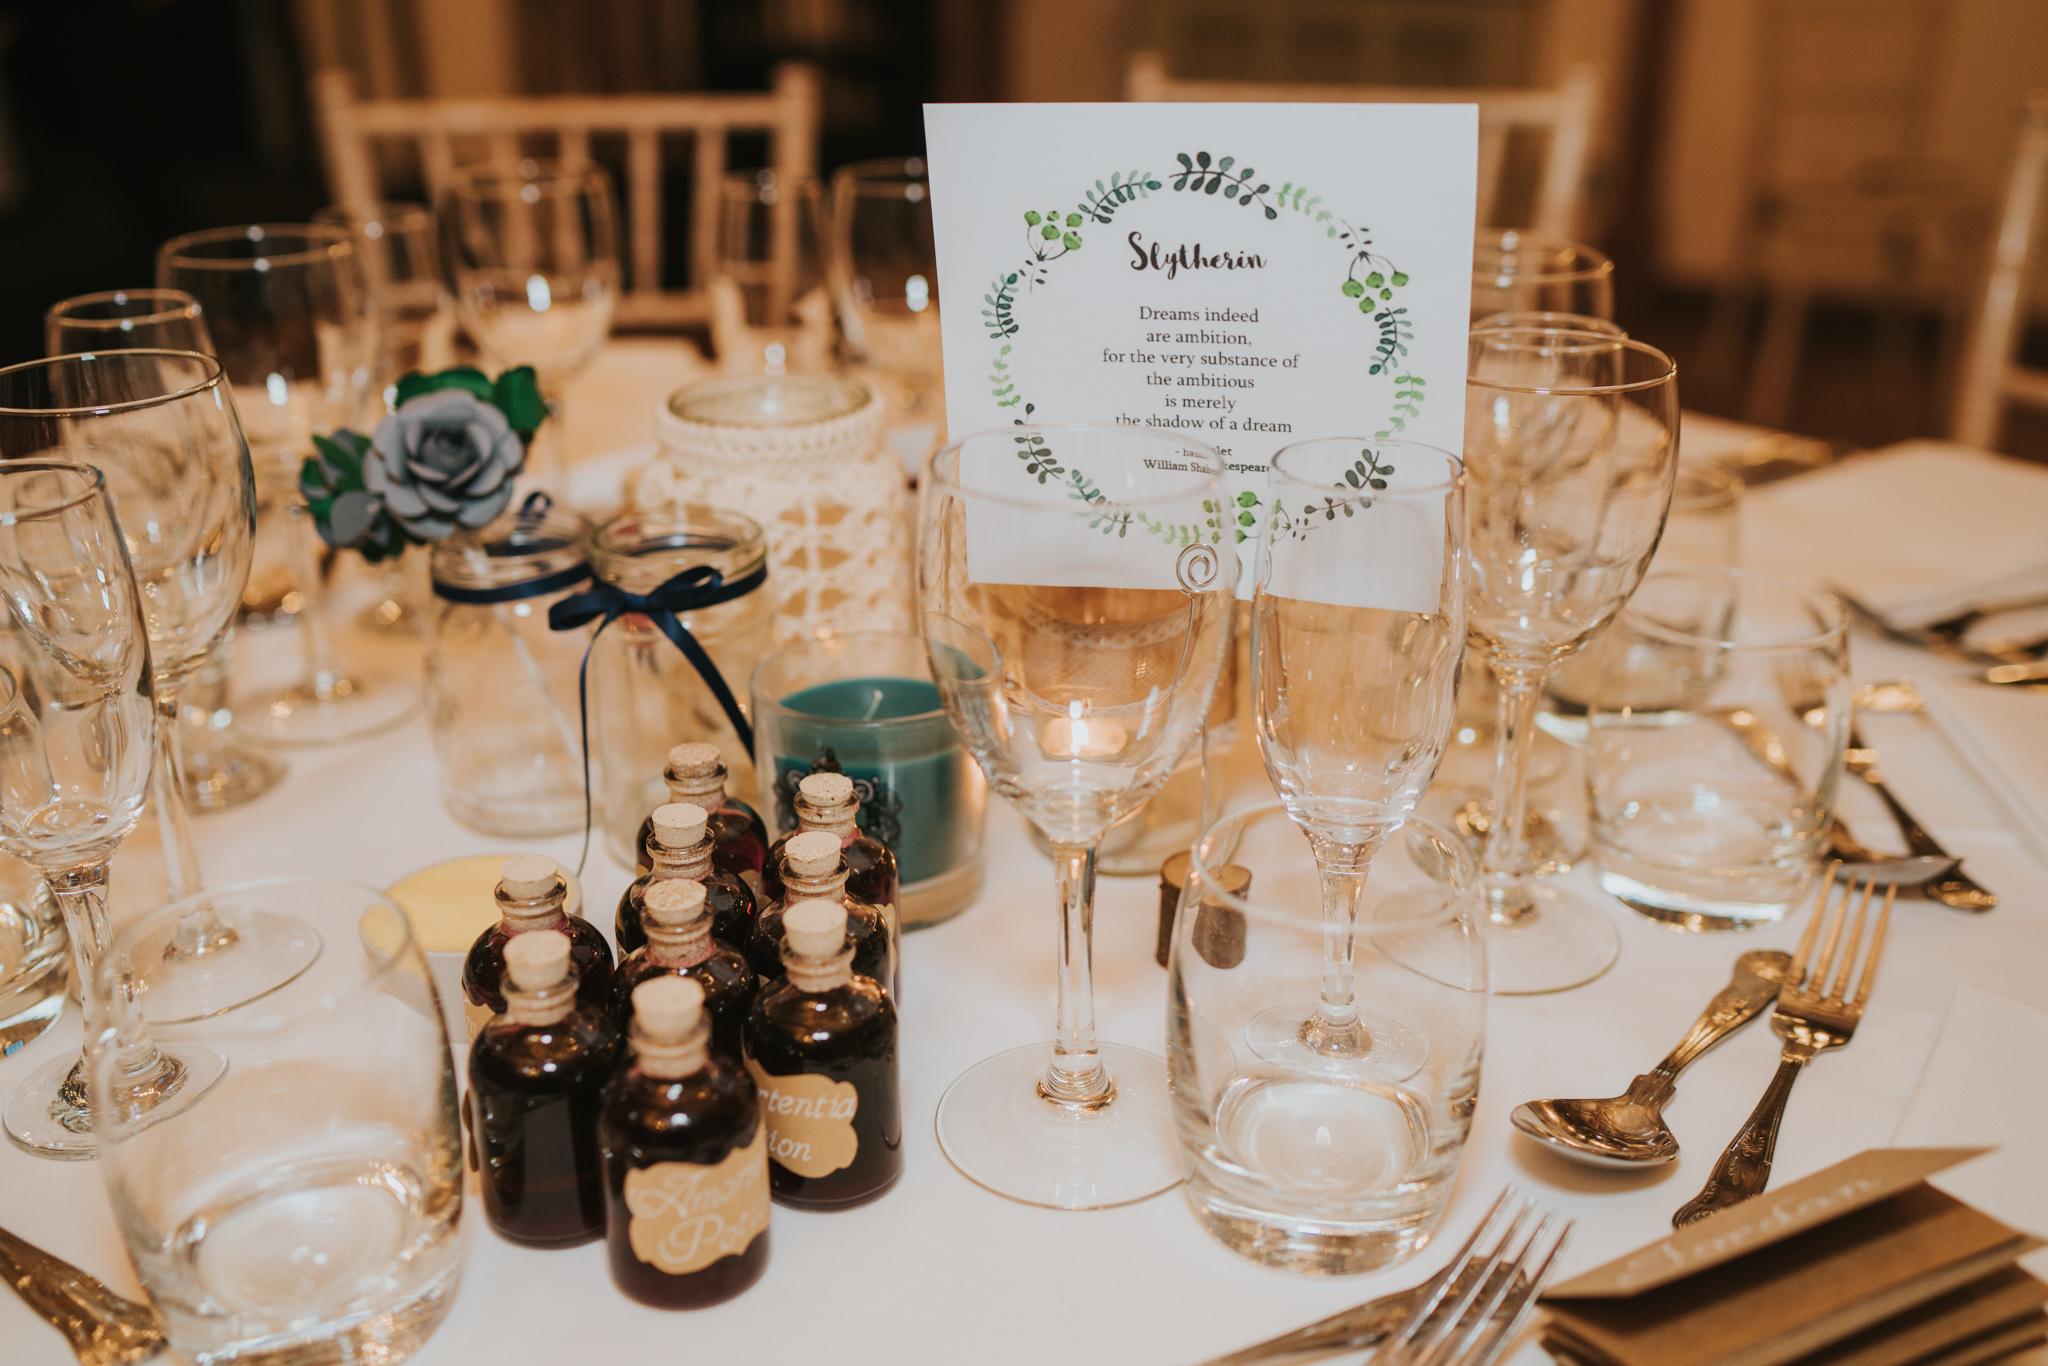 rhia-james-rustic-crabbs-barn-vintage-50s-retro-wedding-grace-elizabeth-colchester-essex-alternative-relaxed-wedding-family-photography-devon-suffolk-norfolk-essex (103 of 138).jpg